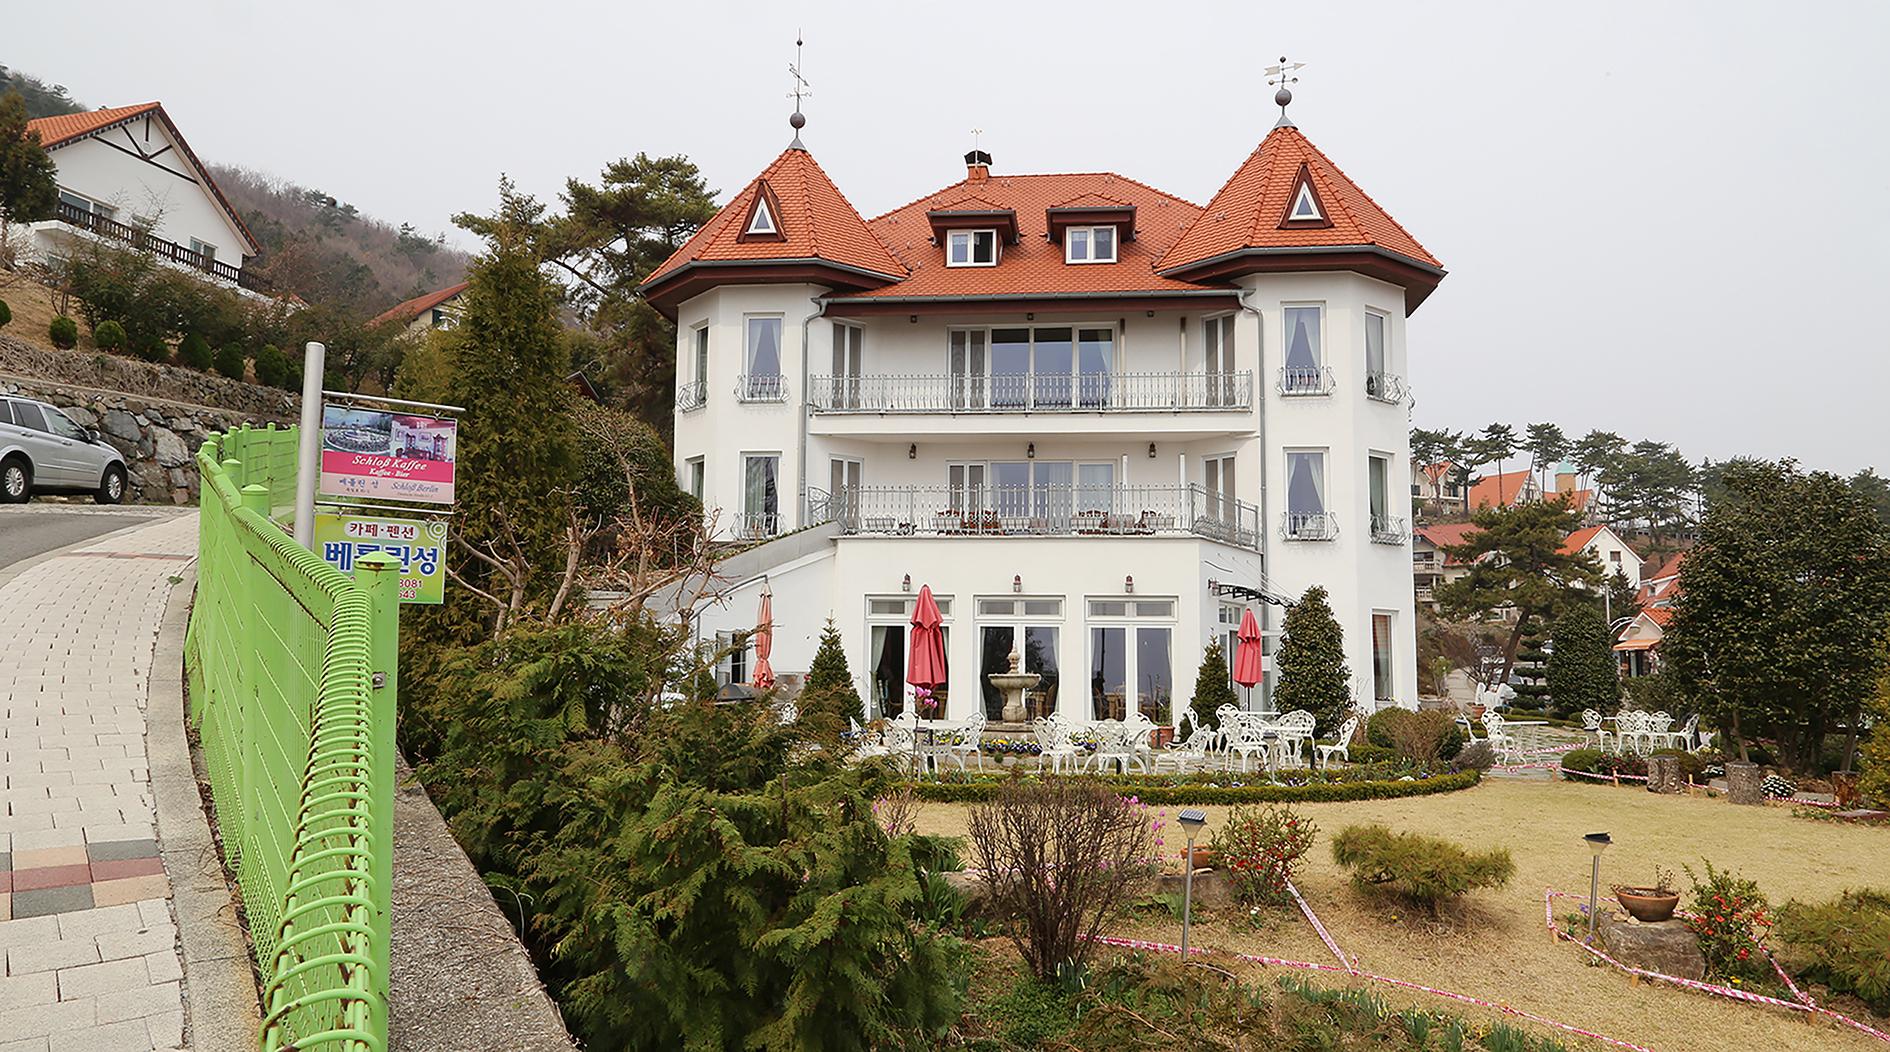 "Berliner Schloss, Dogil Maeul (Südkorea), 2019, Ausstellung: Stefanie Bürkle ""MigraTouriSpace"", Foto: Stefanie Bürkle und Janin Walter, © VG Bild-Kunst Bonn 2021."